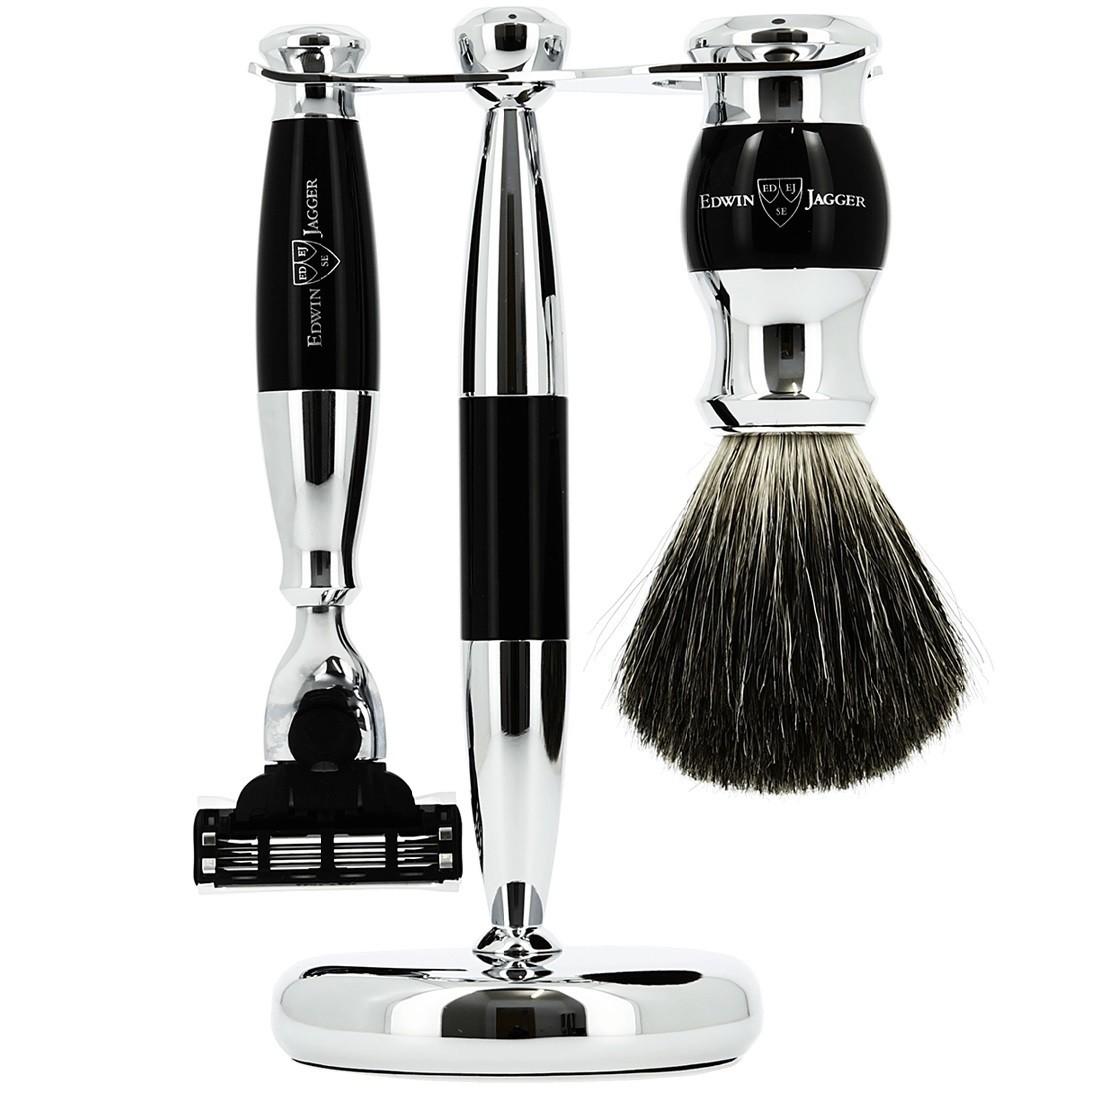 Edwin Jagger S81M356CR - Набор для бритья, черная смола